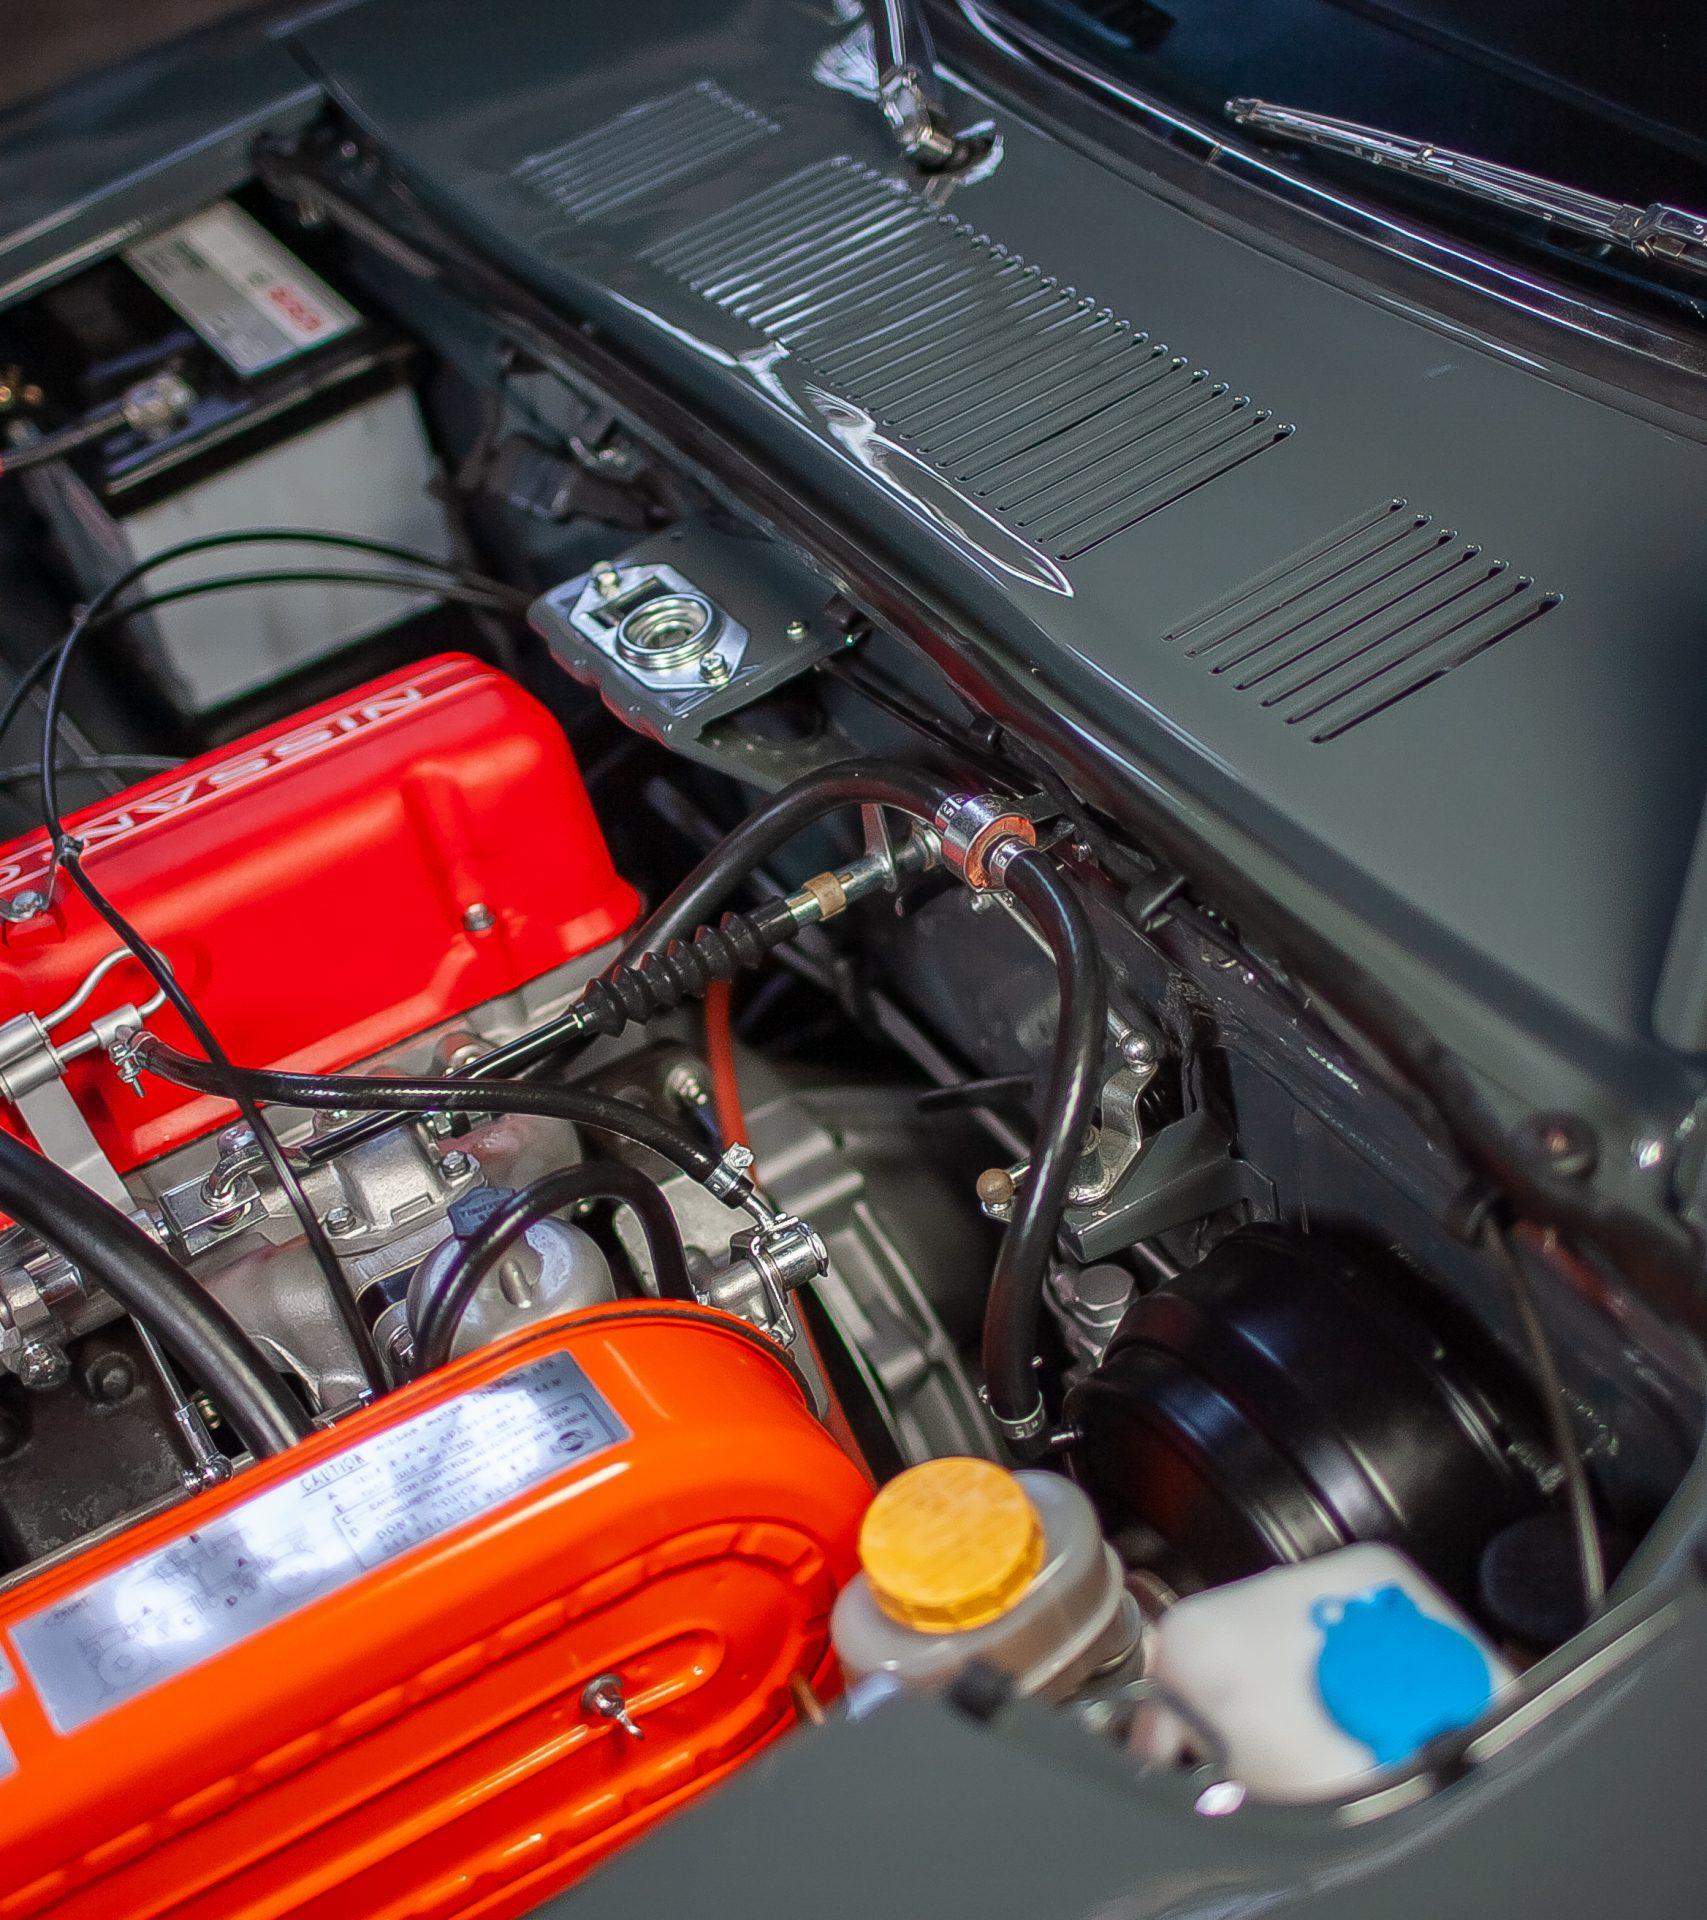 1972 Nissan Datsun 240z Fairlady zu verkaufen Schweiz